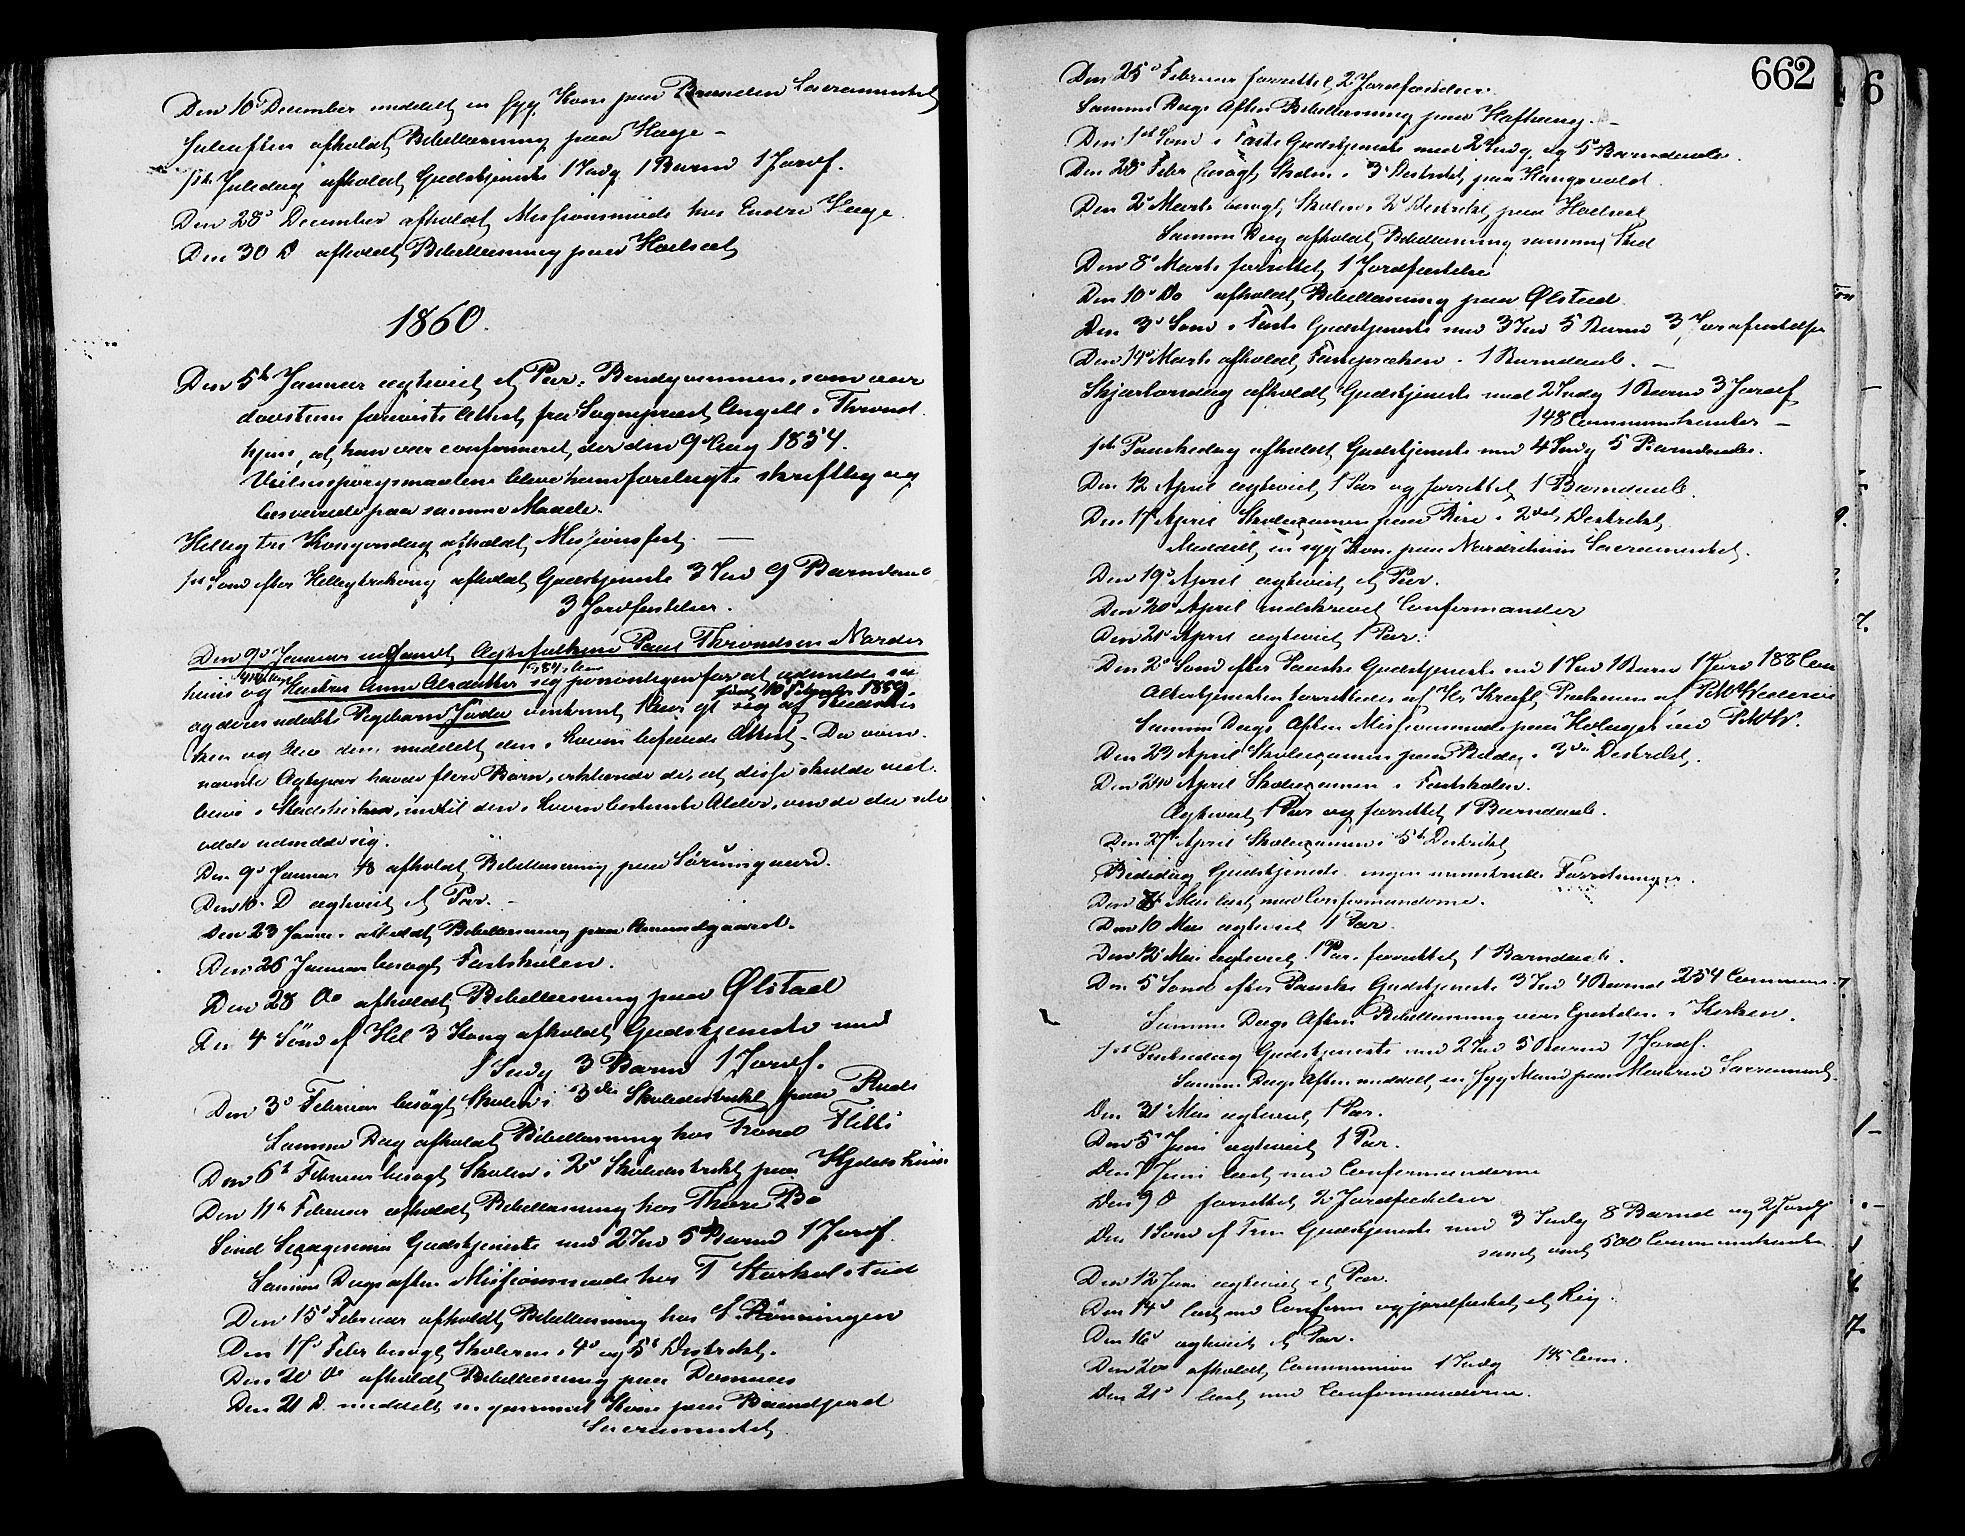 SAH, Lesja prestekontor, Ministerialbok nr. 8, 1854-1880, s. 662